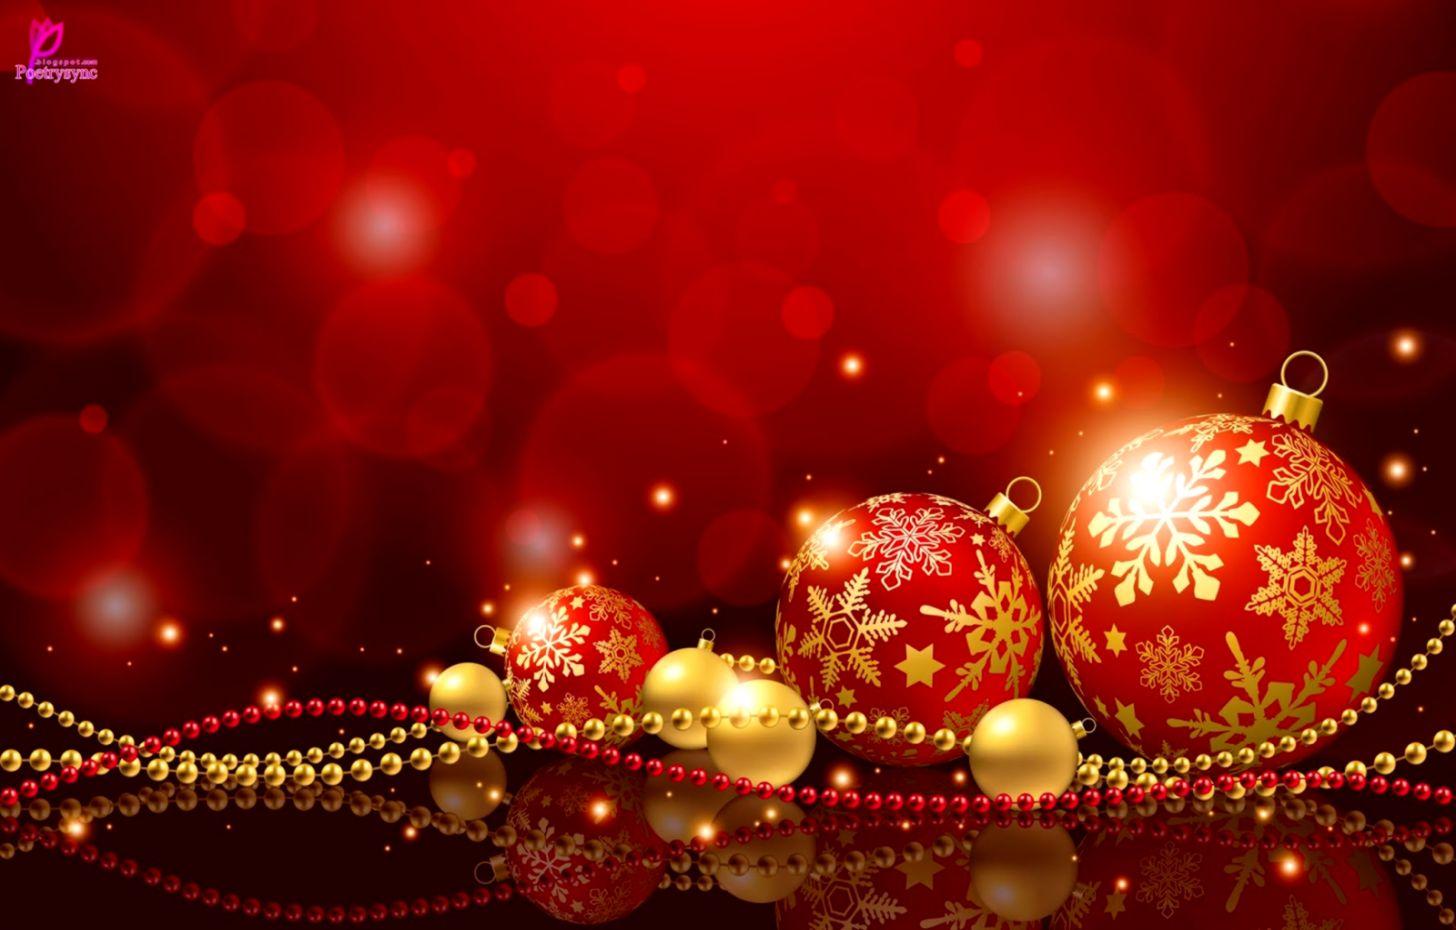 Christmas Hd Wallpaper | Best Wallpapers HD Gallery